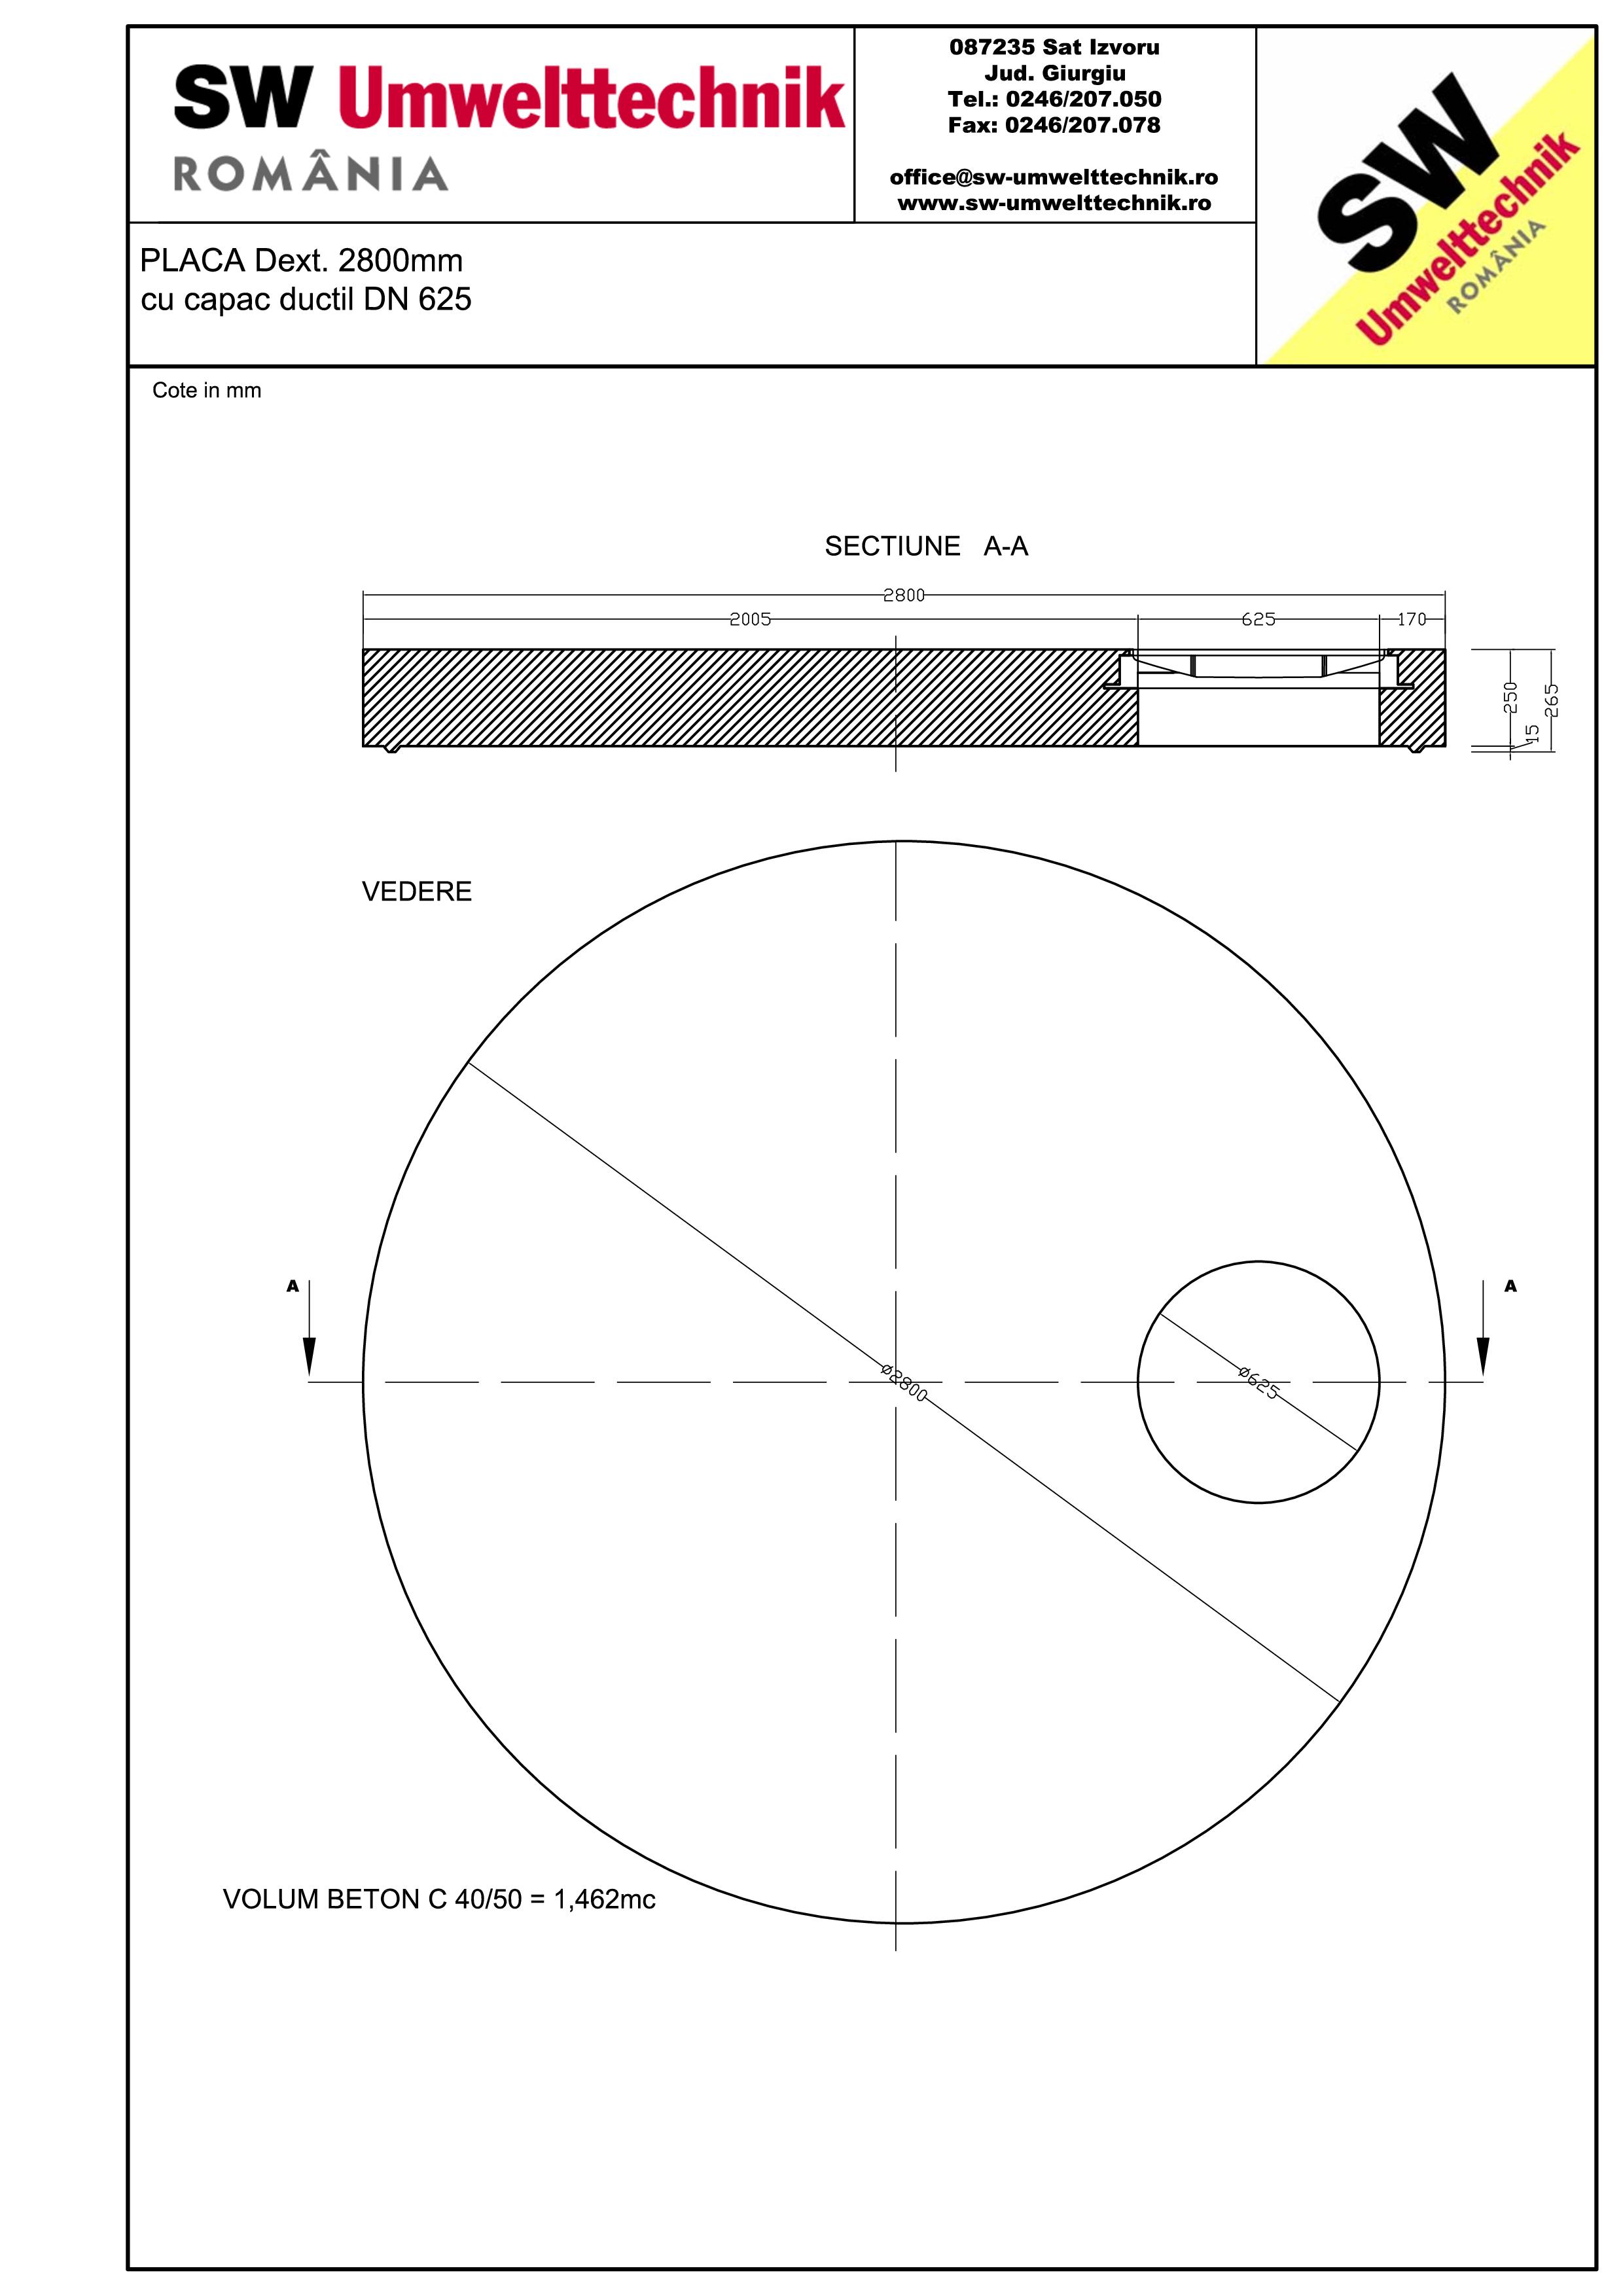 Pagina 1 - CAD-PDF Placa Dext. 2800 H250 cu capac ductil DN625 SW UMWELTTECHNIK Detaliu de produs